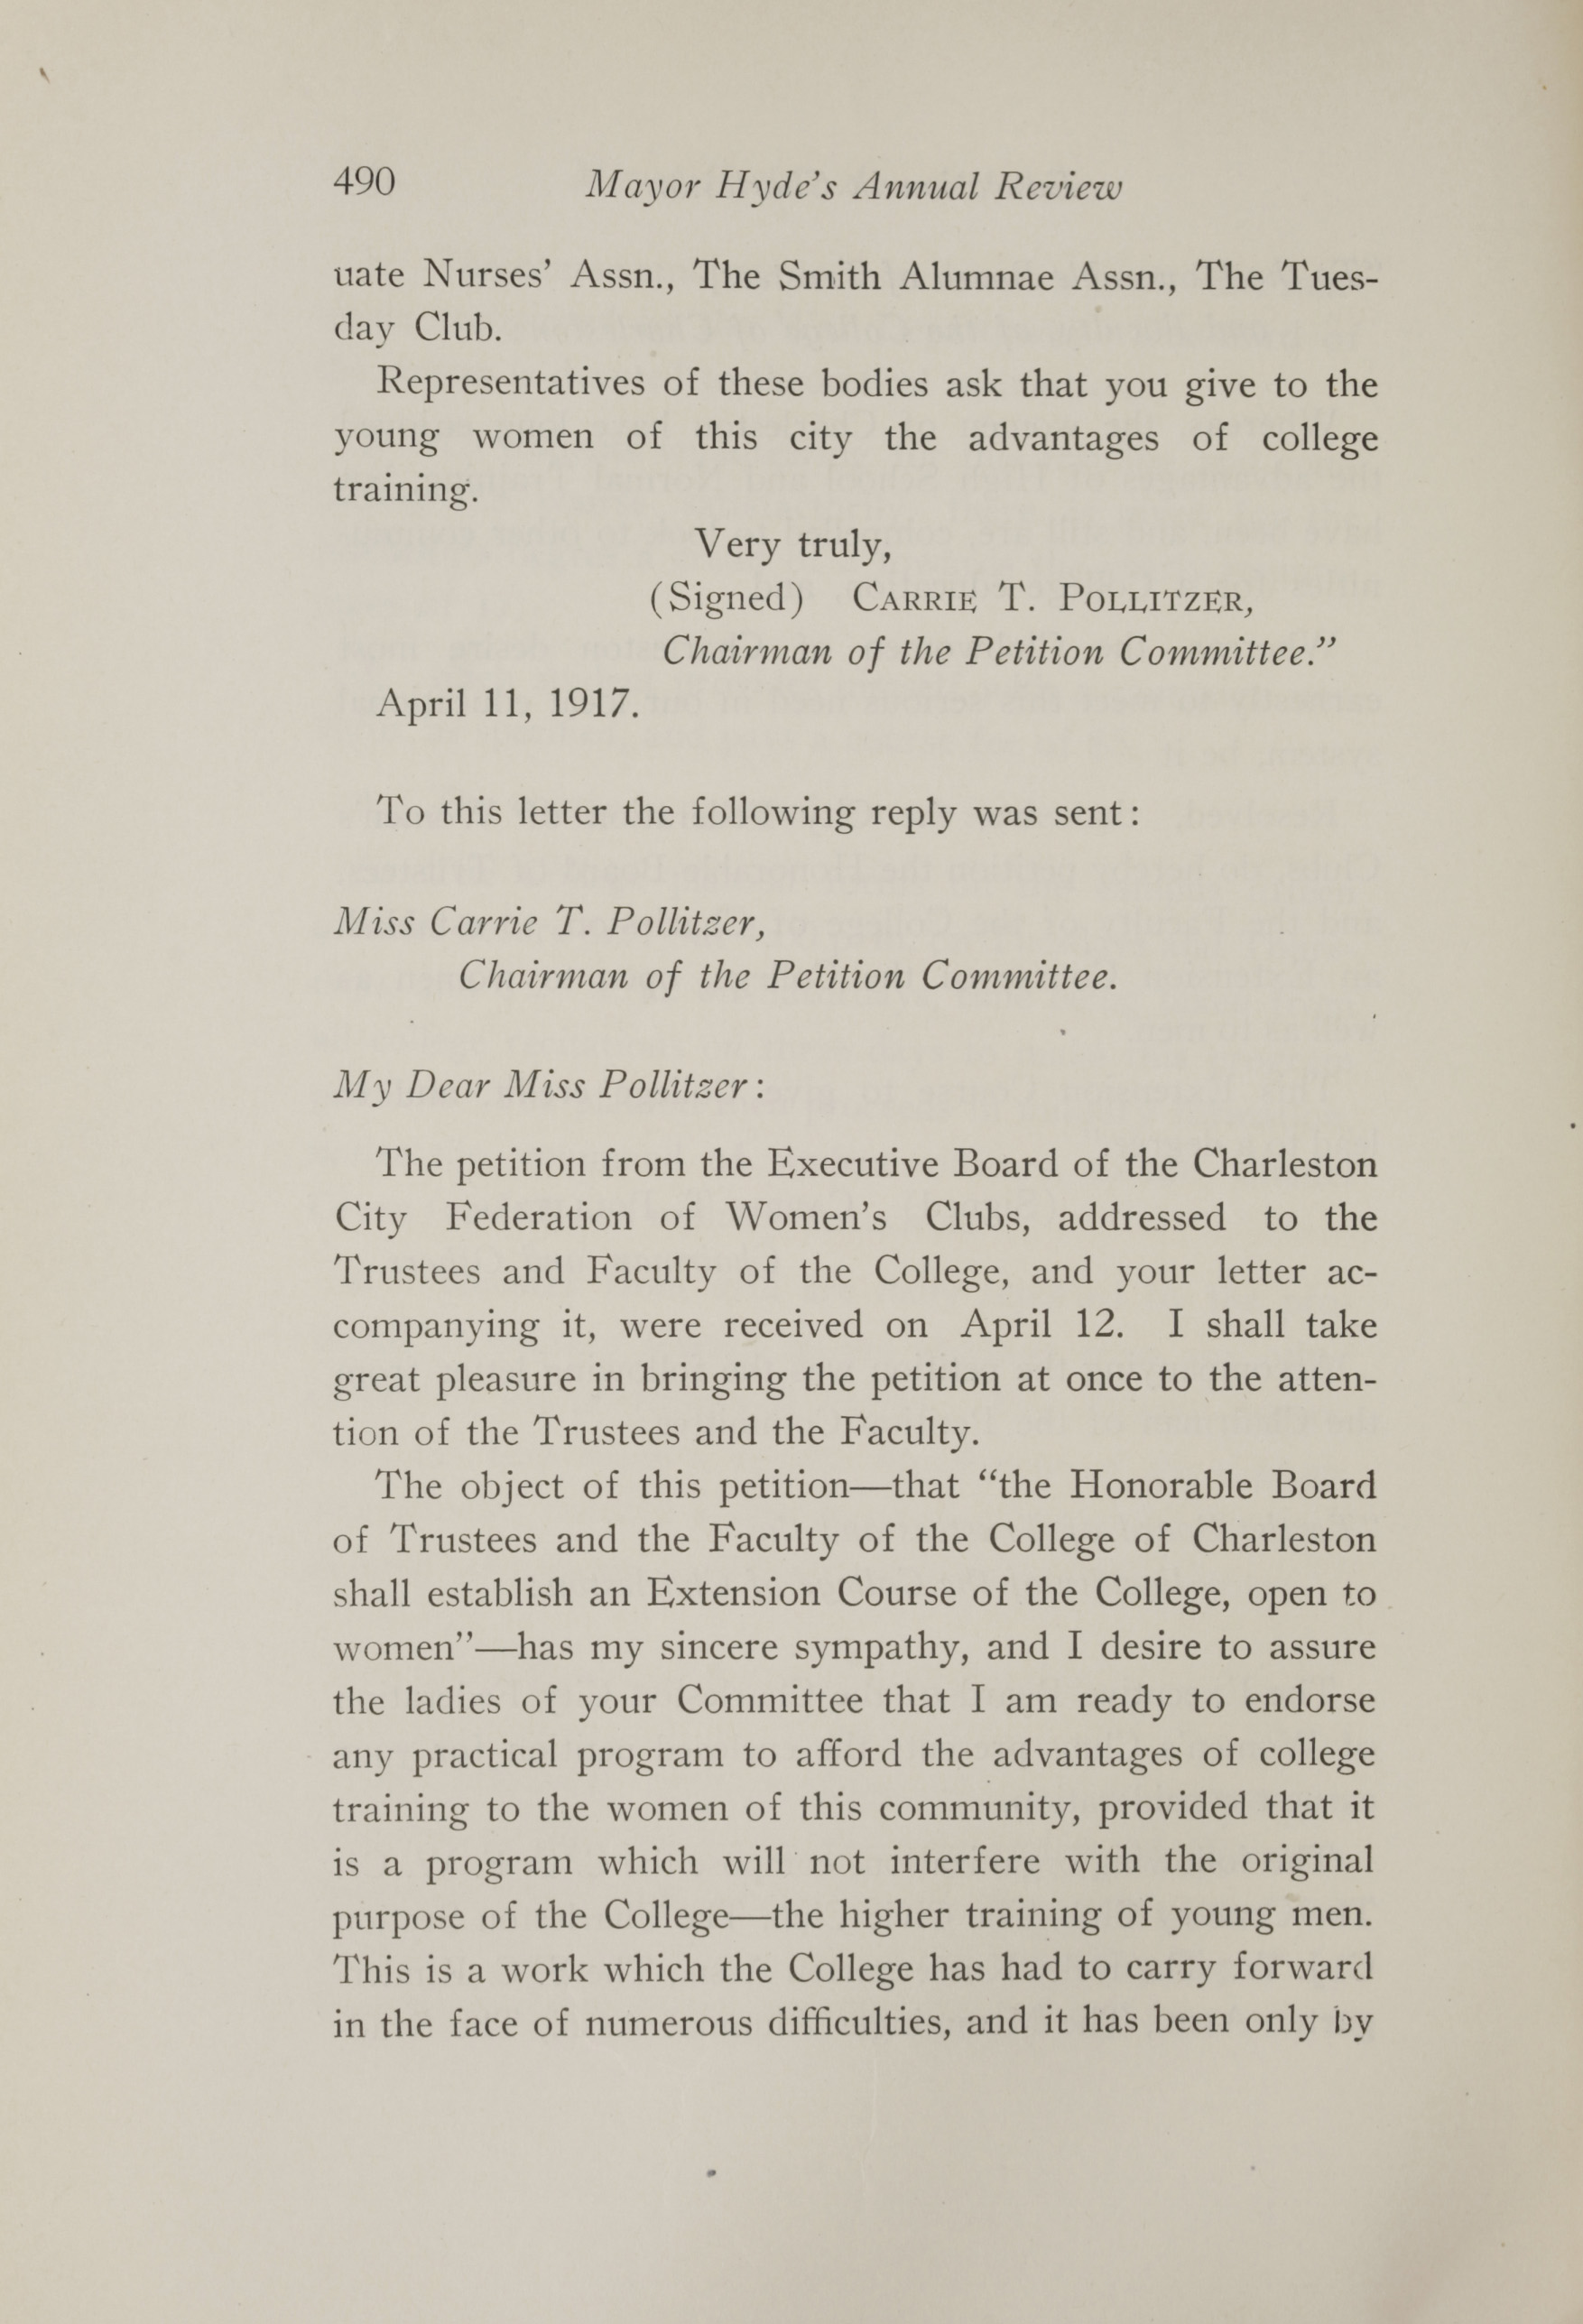 Charleston Yearbook, 1917, page 490